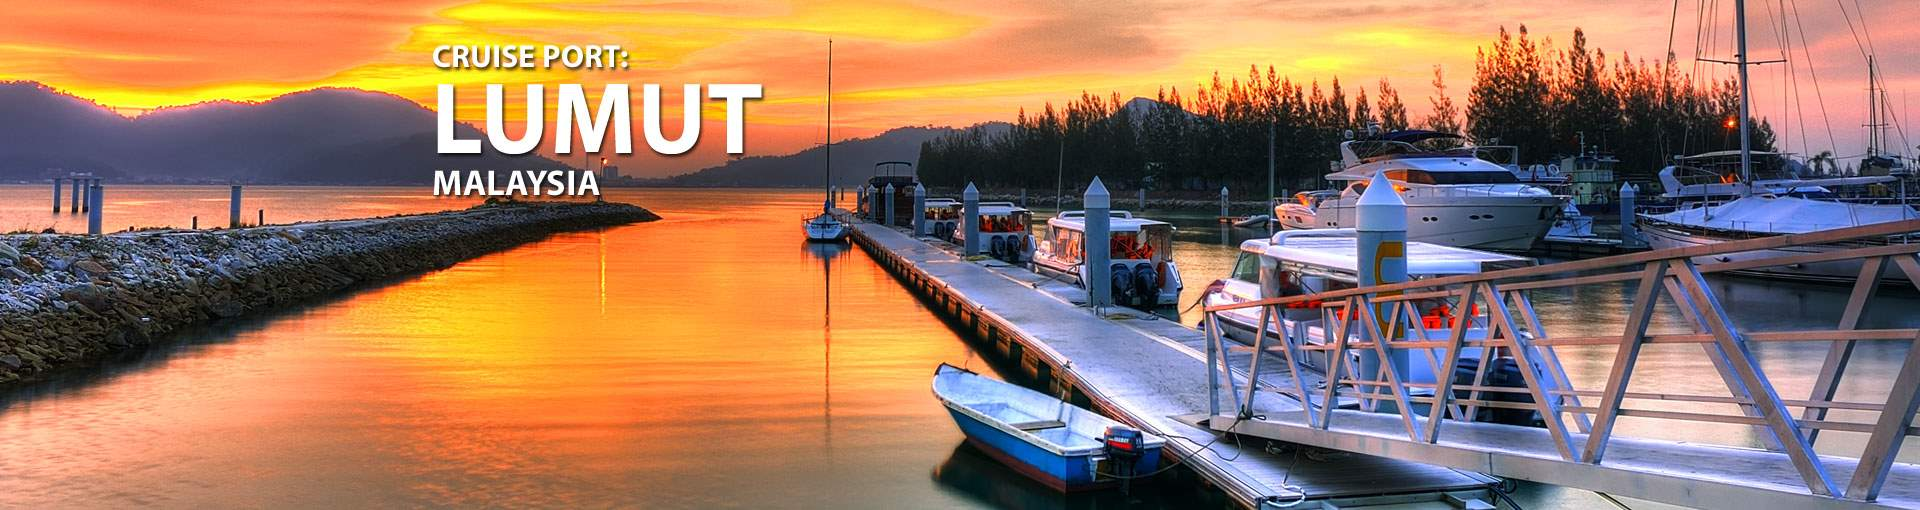 Cruises to Lumut, Malaysia